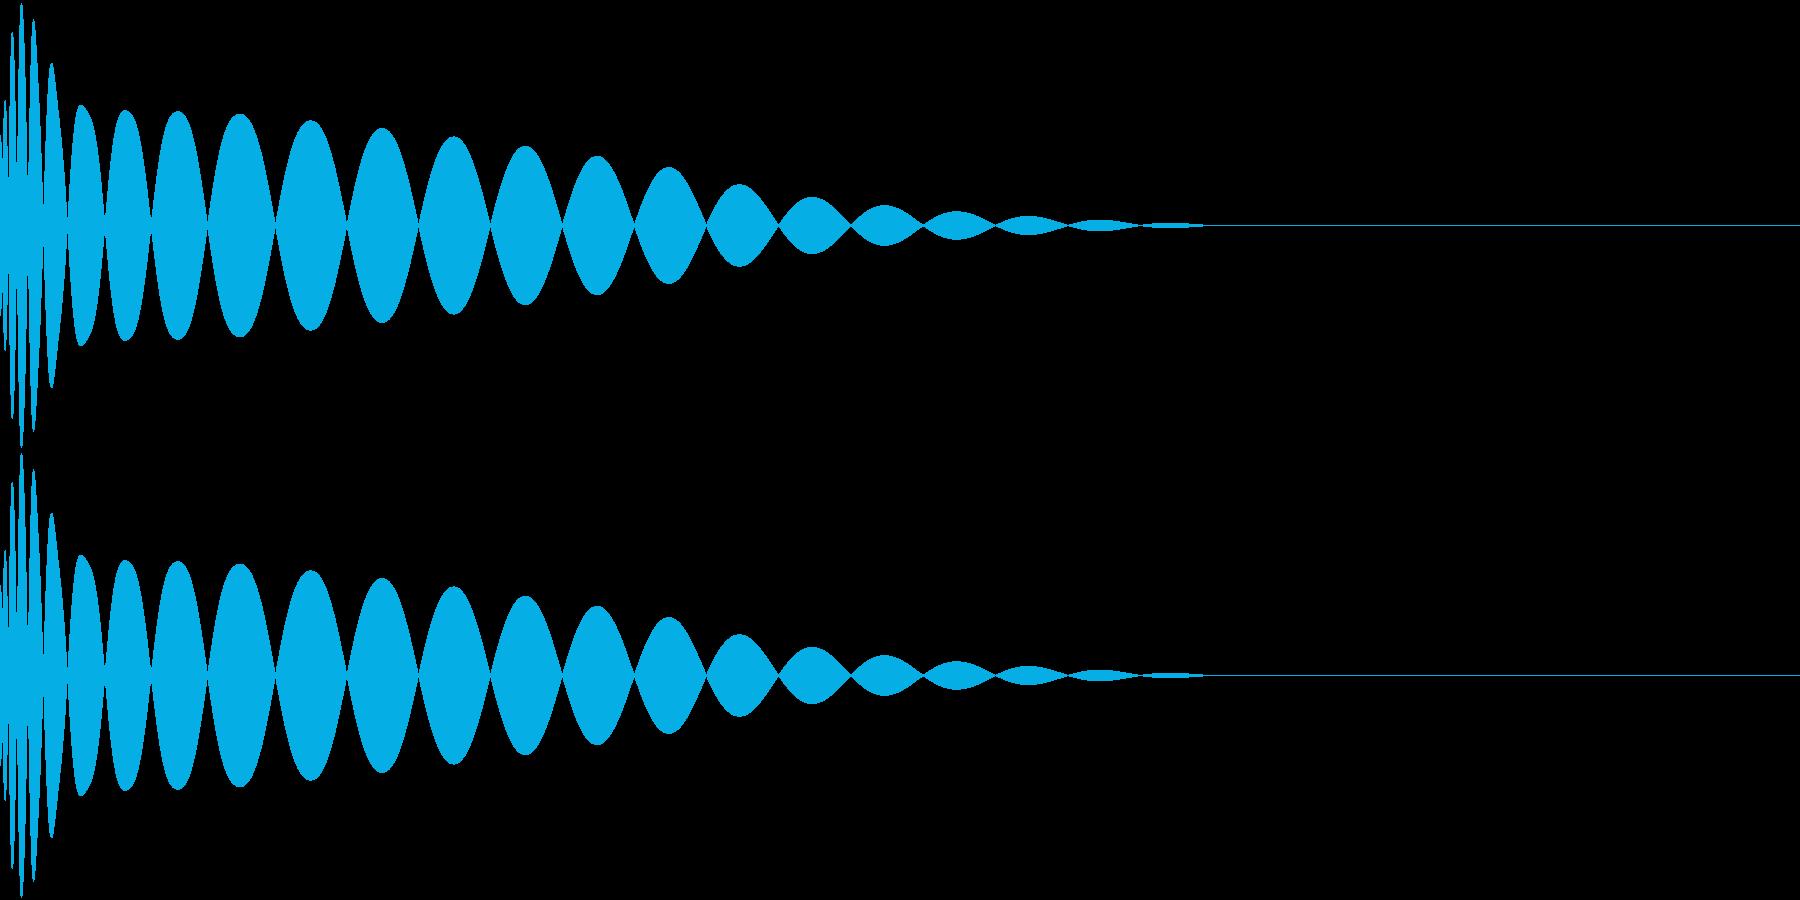 DTM Kick 1 オリジナル音源の再生済みの波形